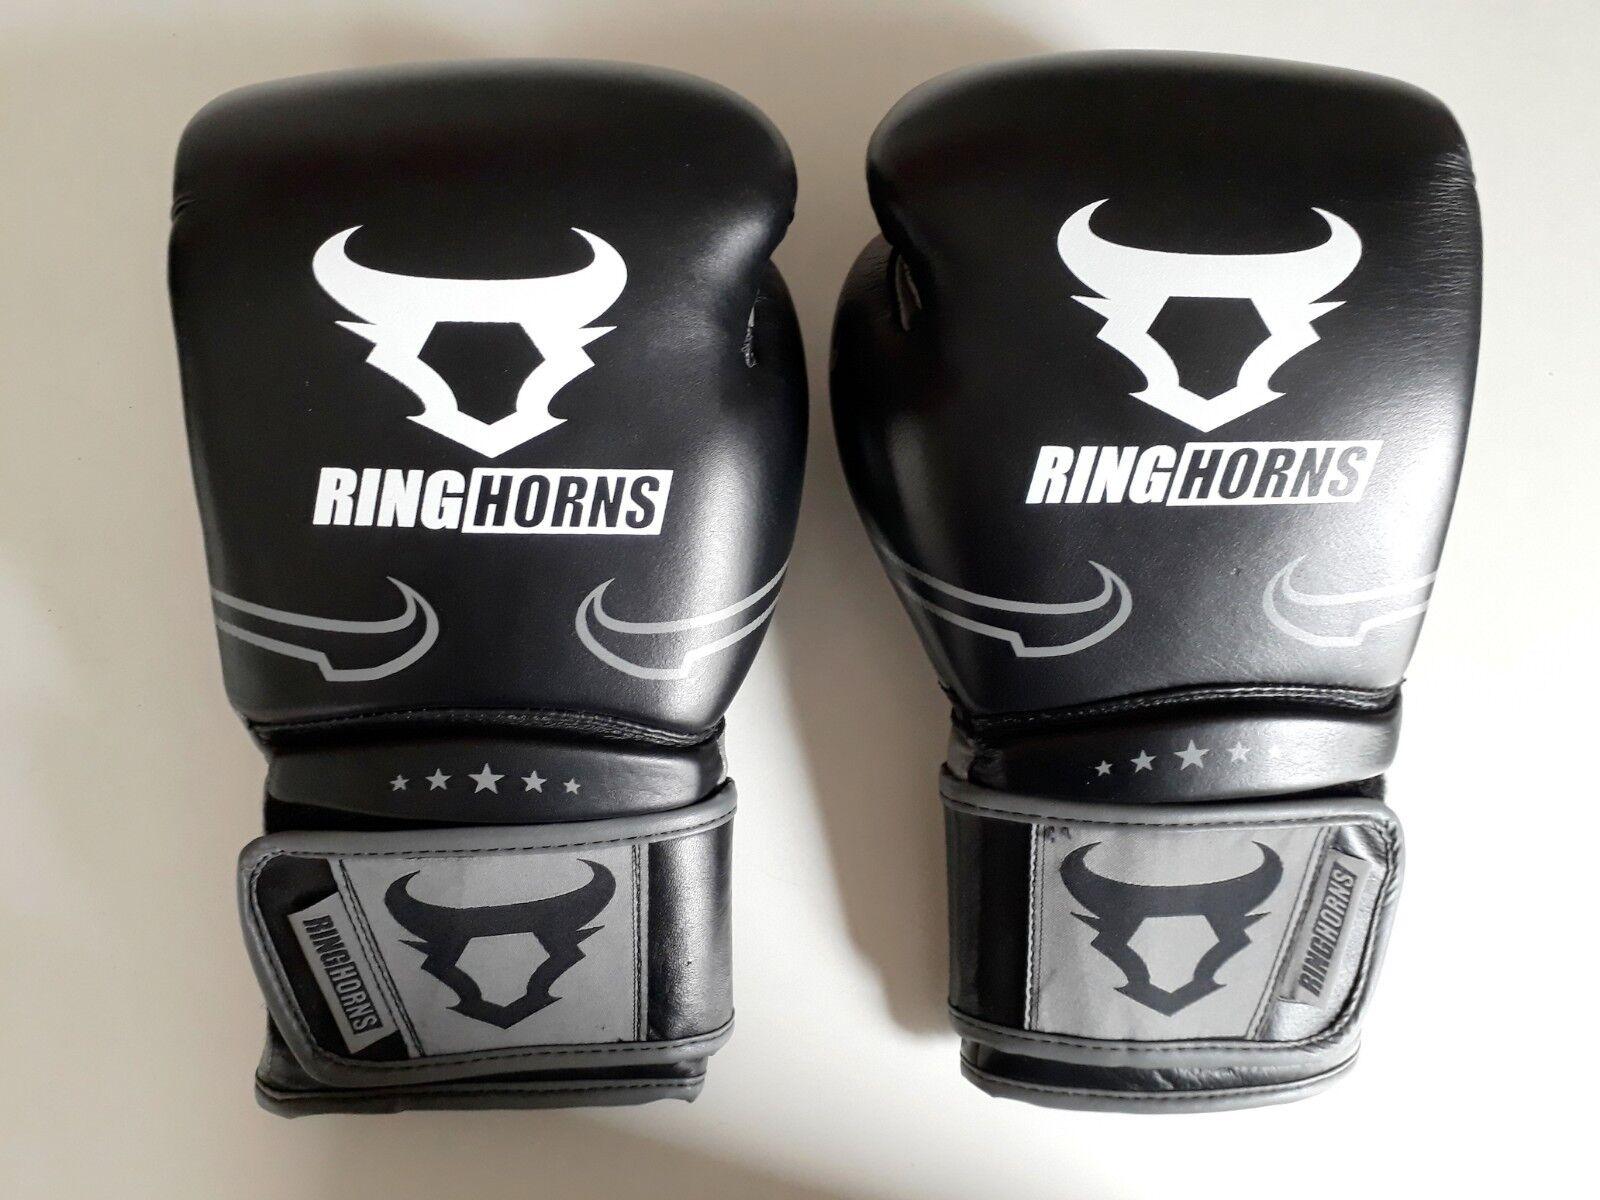 Muay Thai-Set: OZ, Boxhandschuhe Venum/Ringhorns, 12 OZ, Thai-Set: Leder, Bandage, Springseil 90fbaf